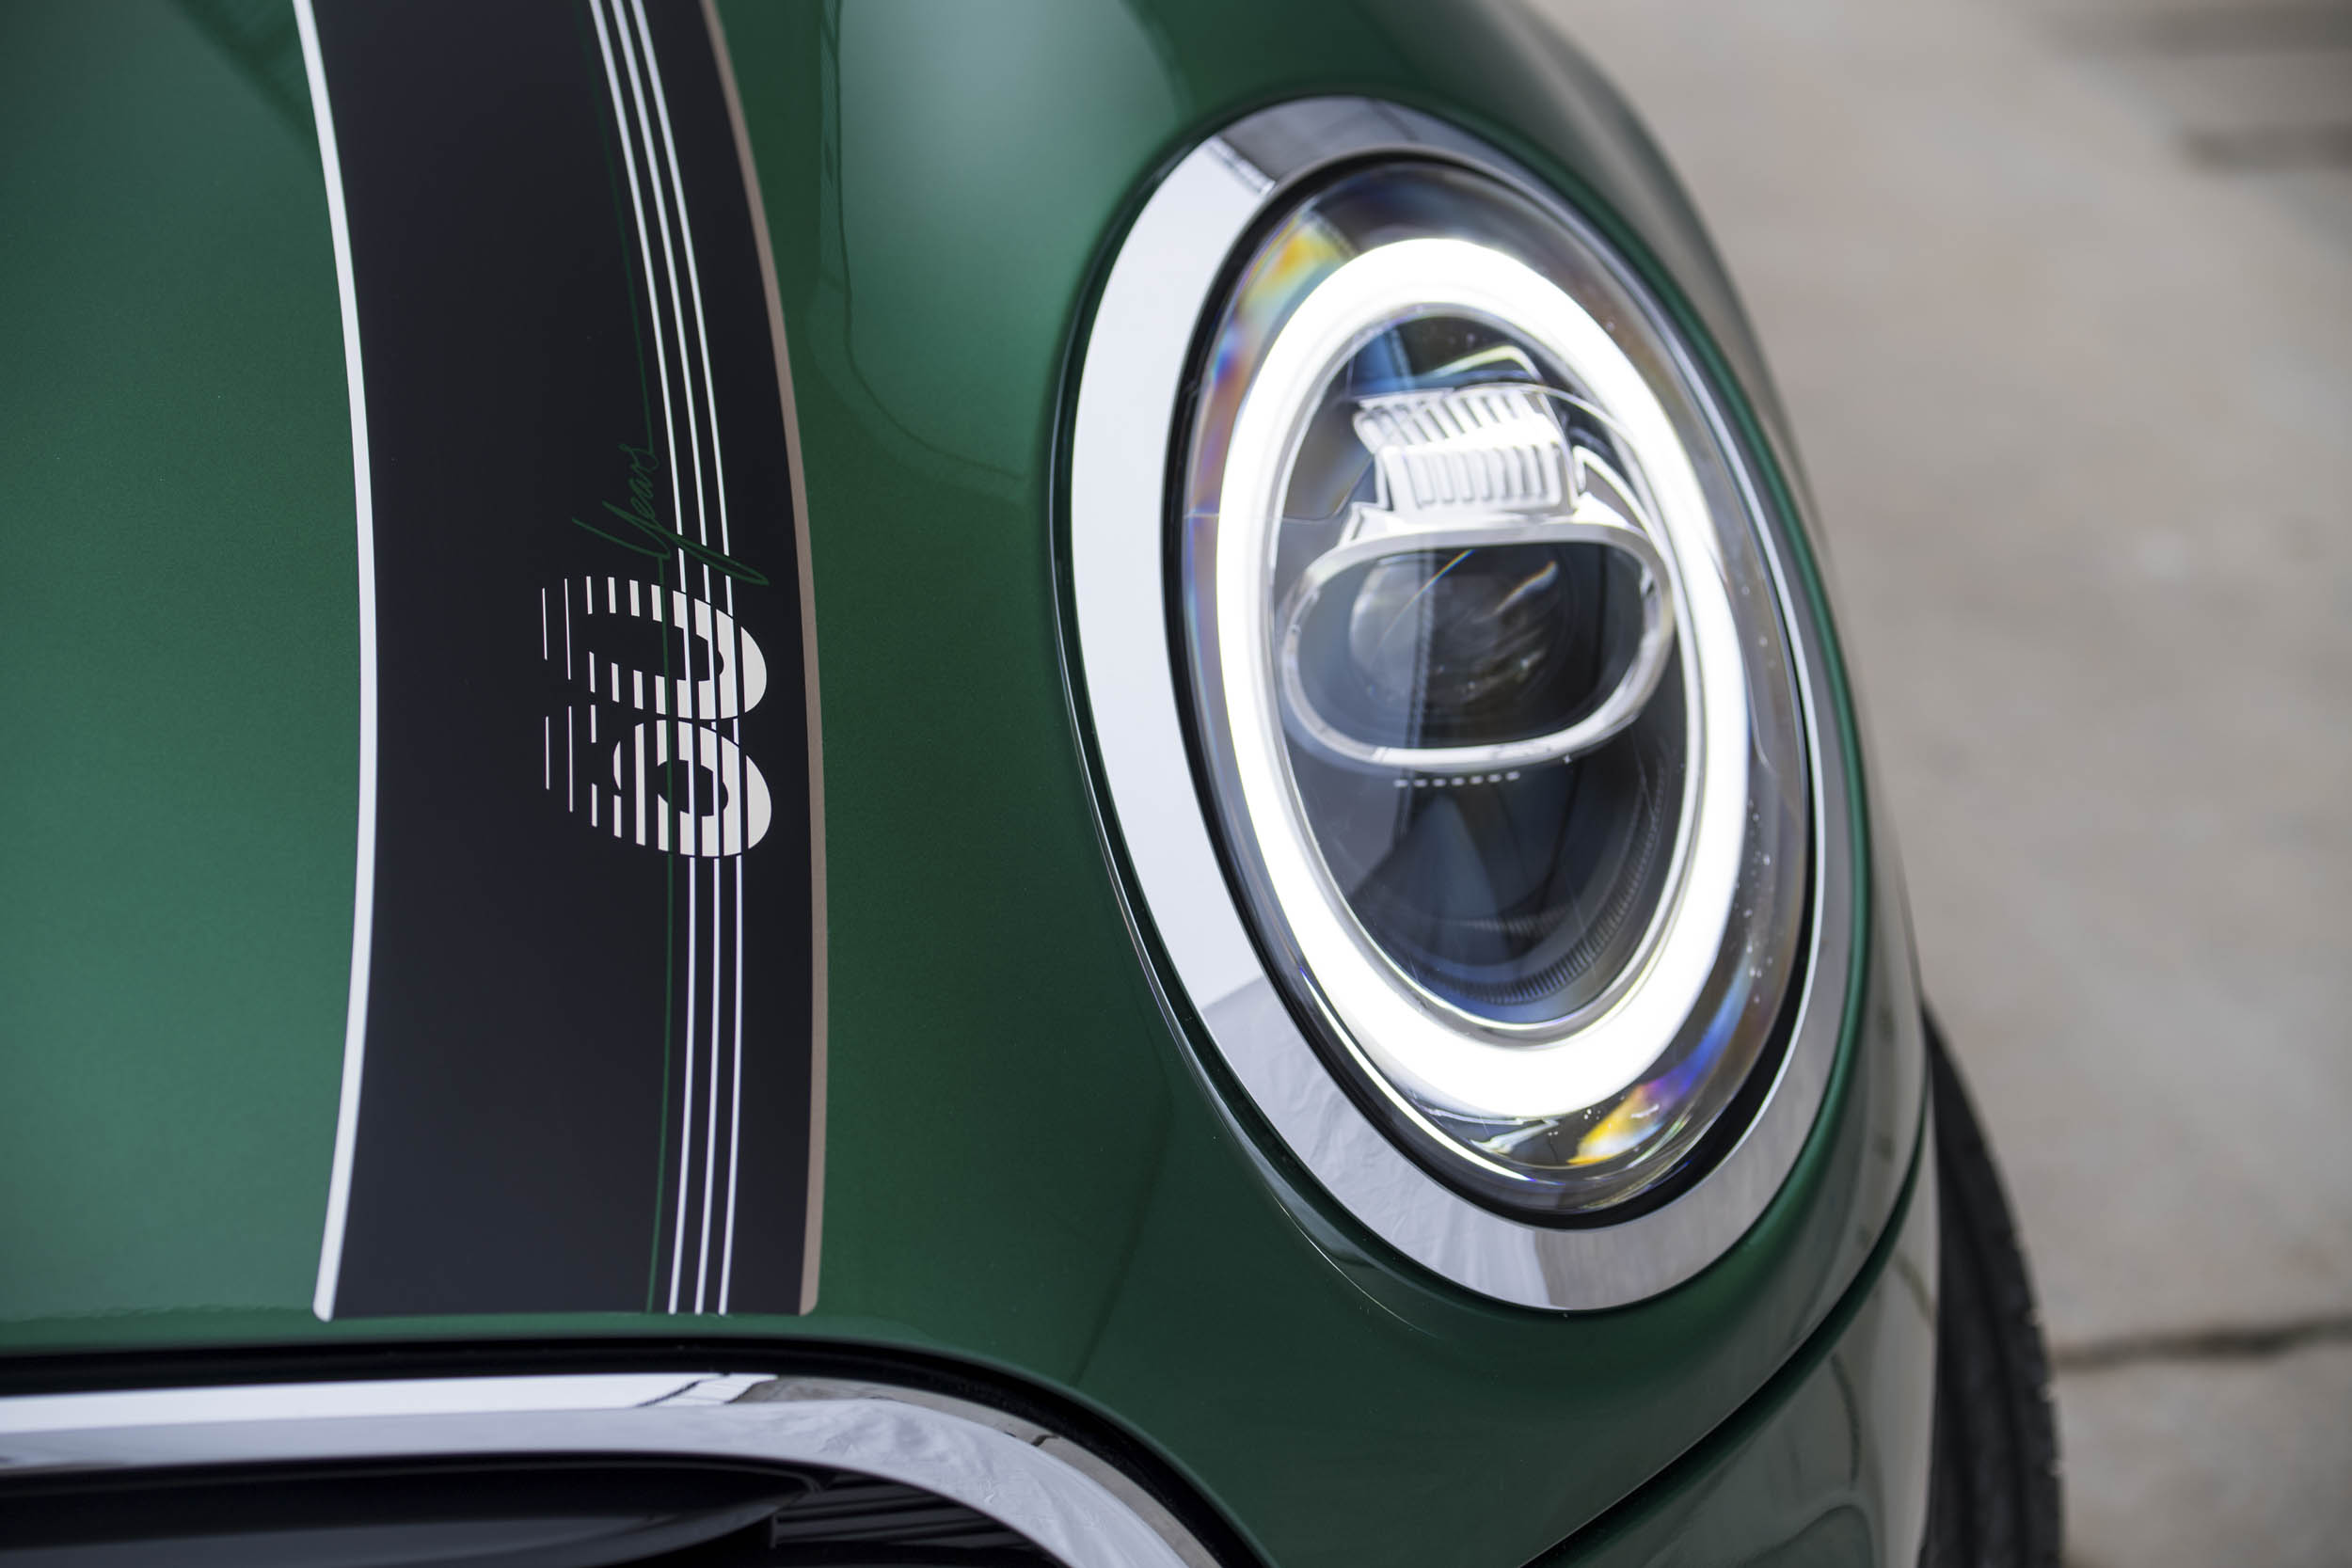 60th anniversary Mini Cooper headlight and paint detail